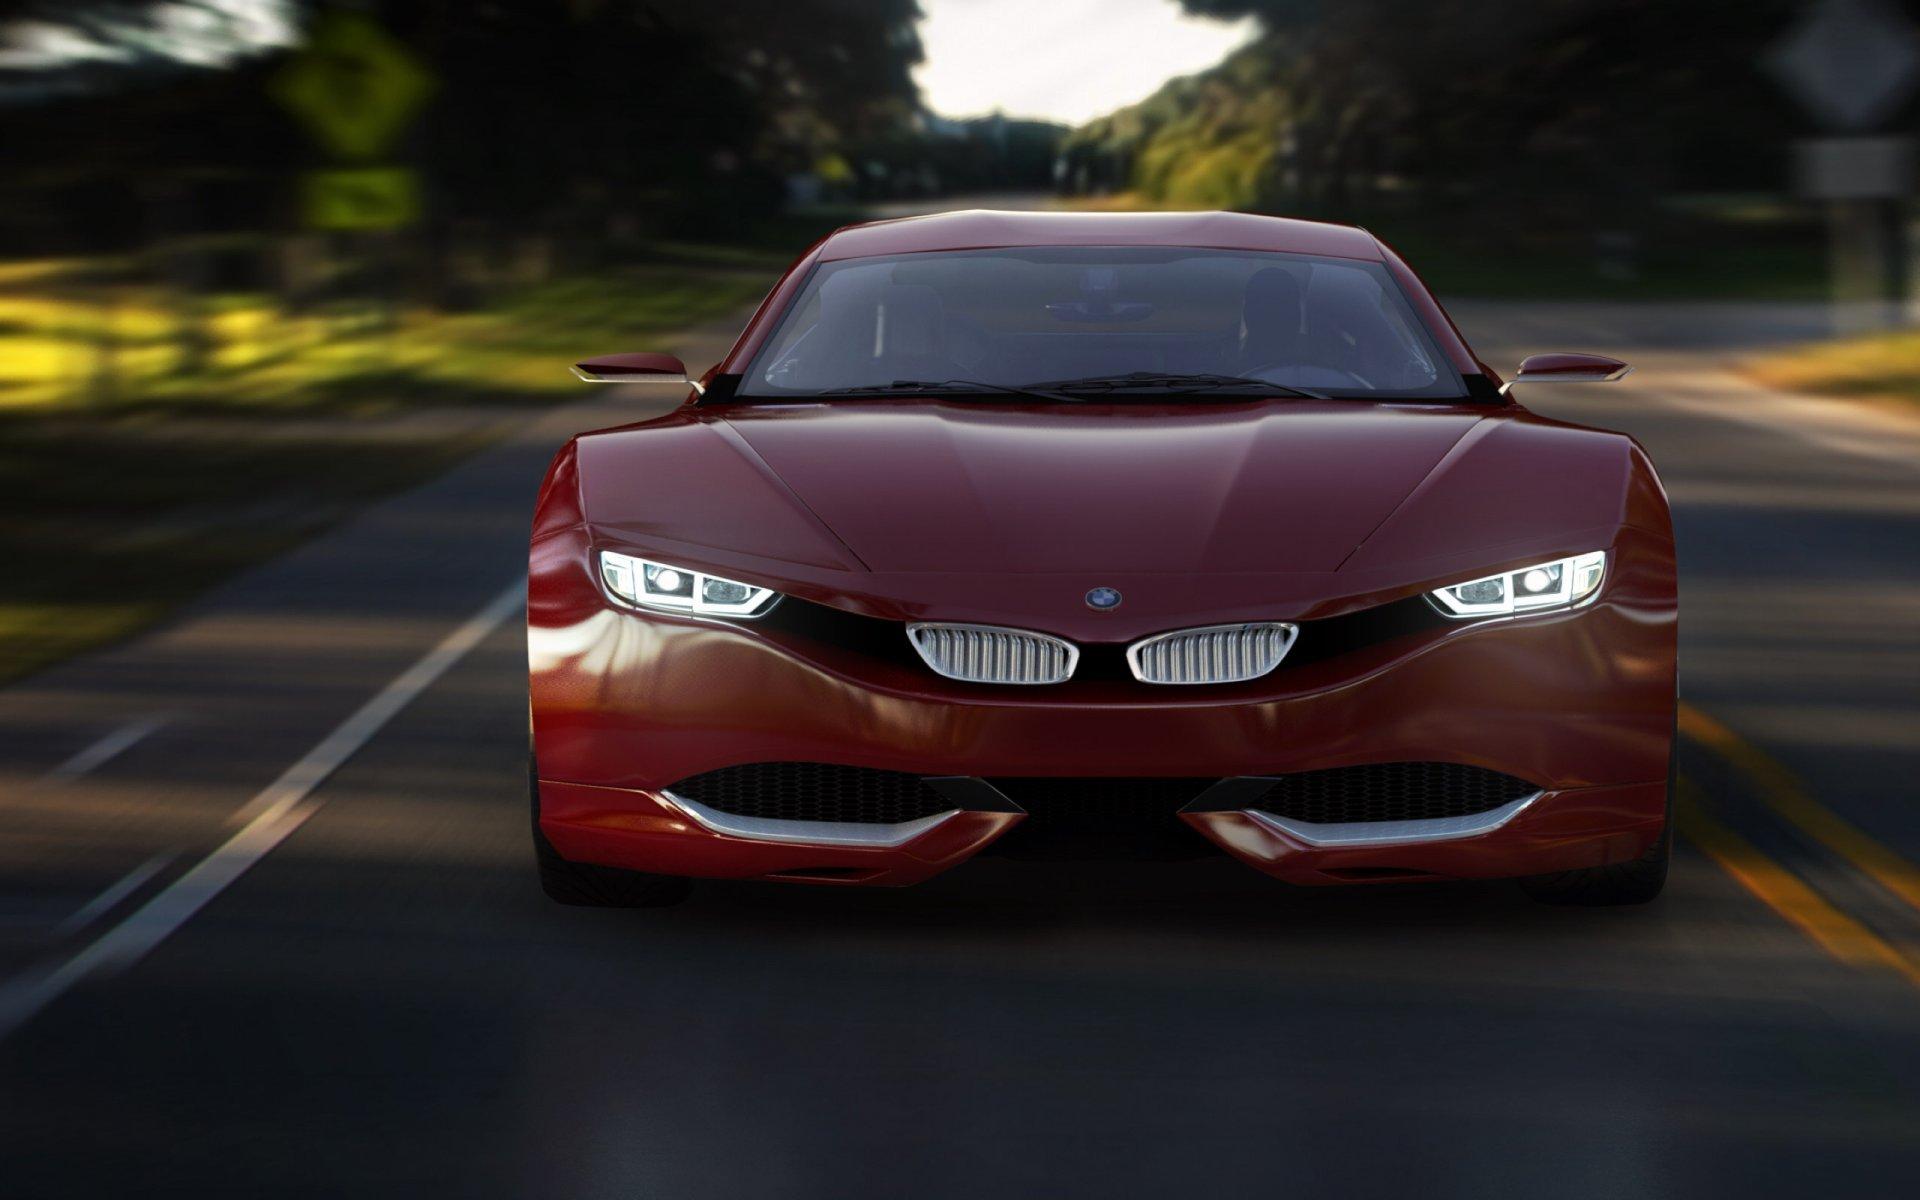 <b>Bmw</b> car image <b>download free</b> stock photos <b>download</b> (1,504 <b>Free</b> ...